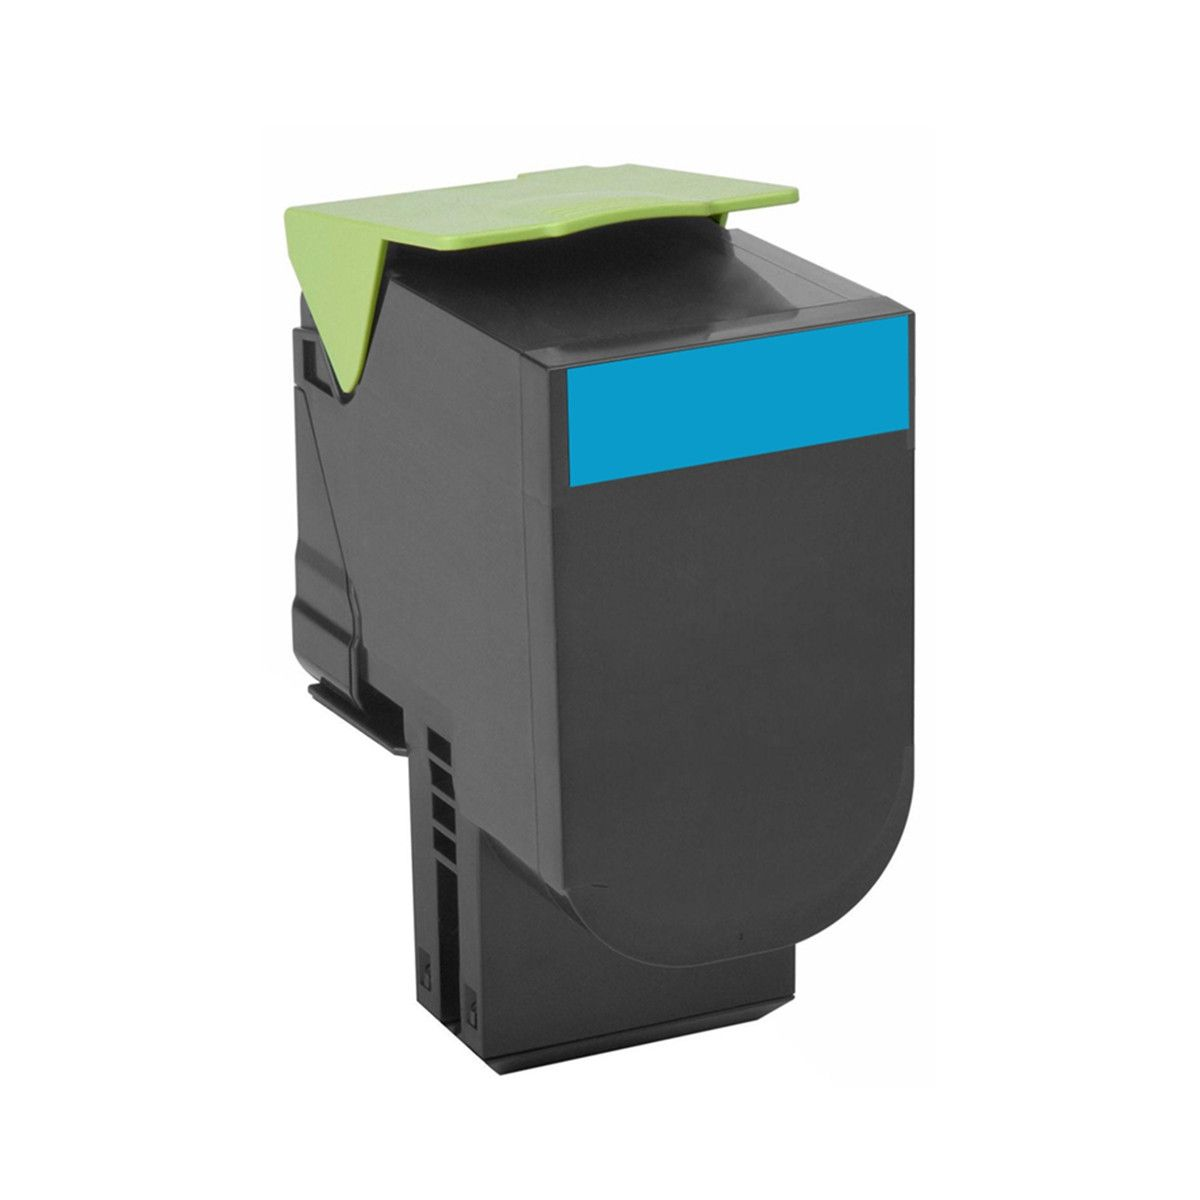 Kit 4 Toners Compatíveis Lexmark [71B4HK0] CX417/517 - Black / Cyan / Yellow / Magenta - Cartucho & Cia